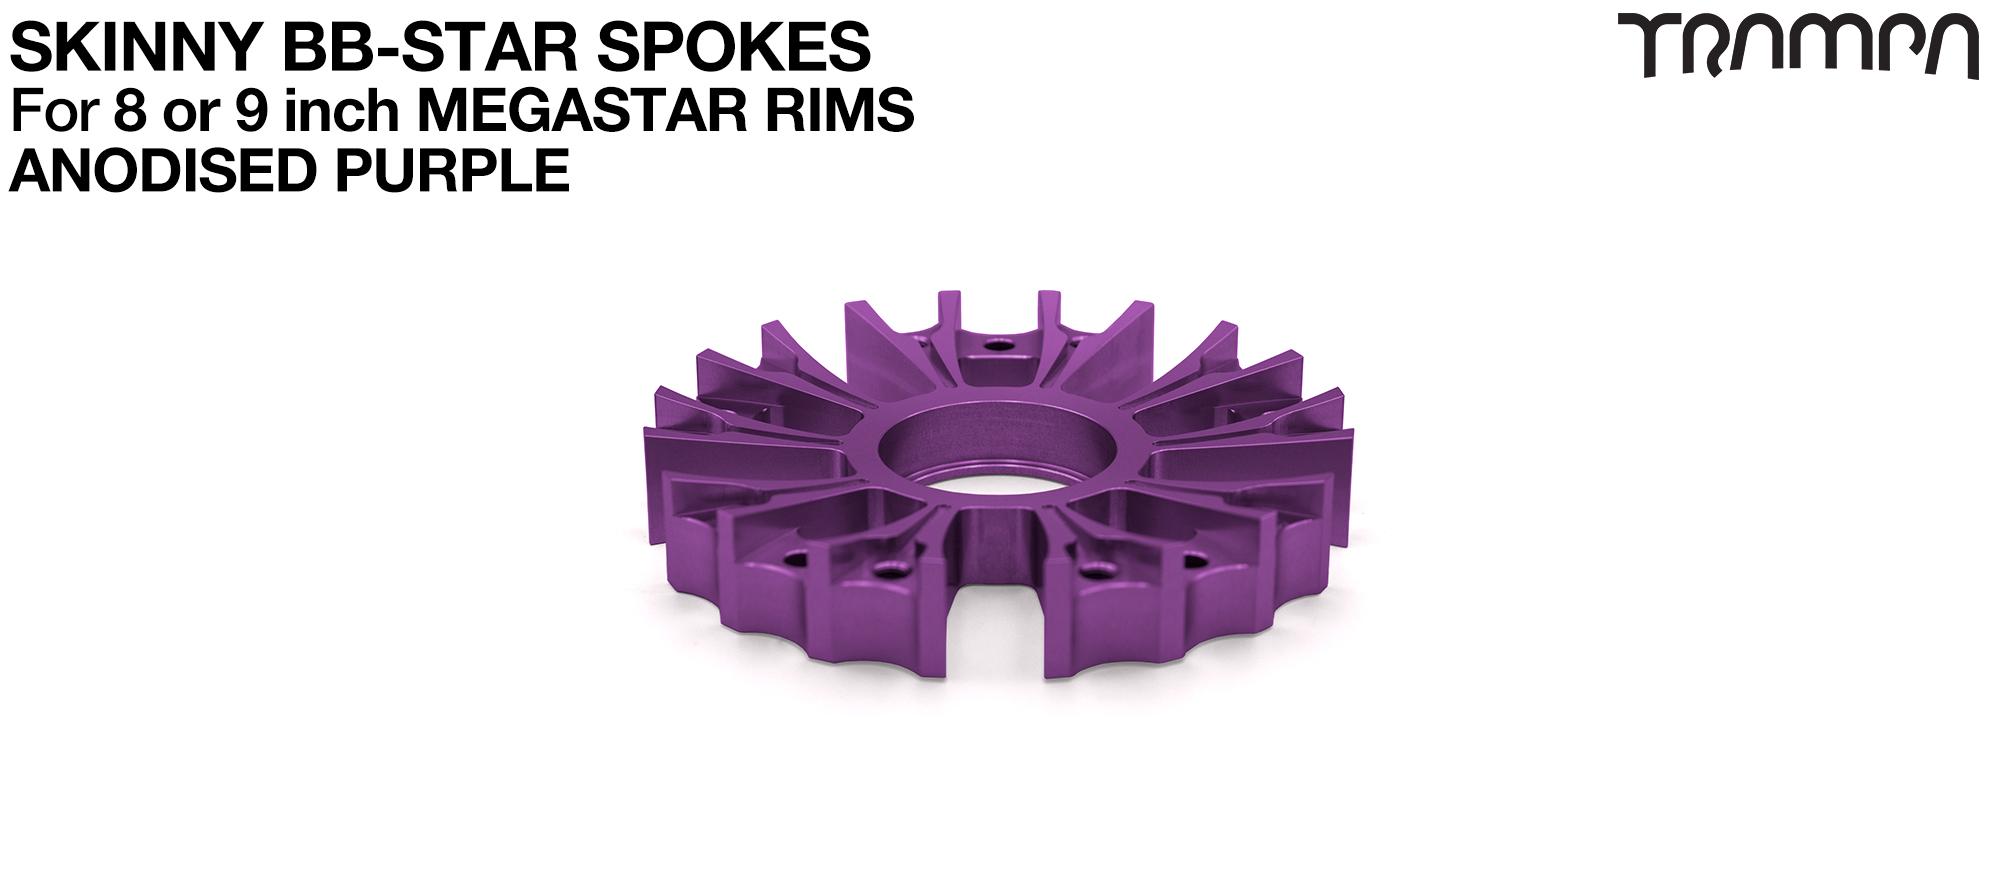 BB Star Spoke for 8 Inch DEEP-DISH MEGASTAR Rim - CNC Precision milled - PURPLE